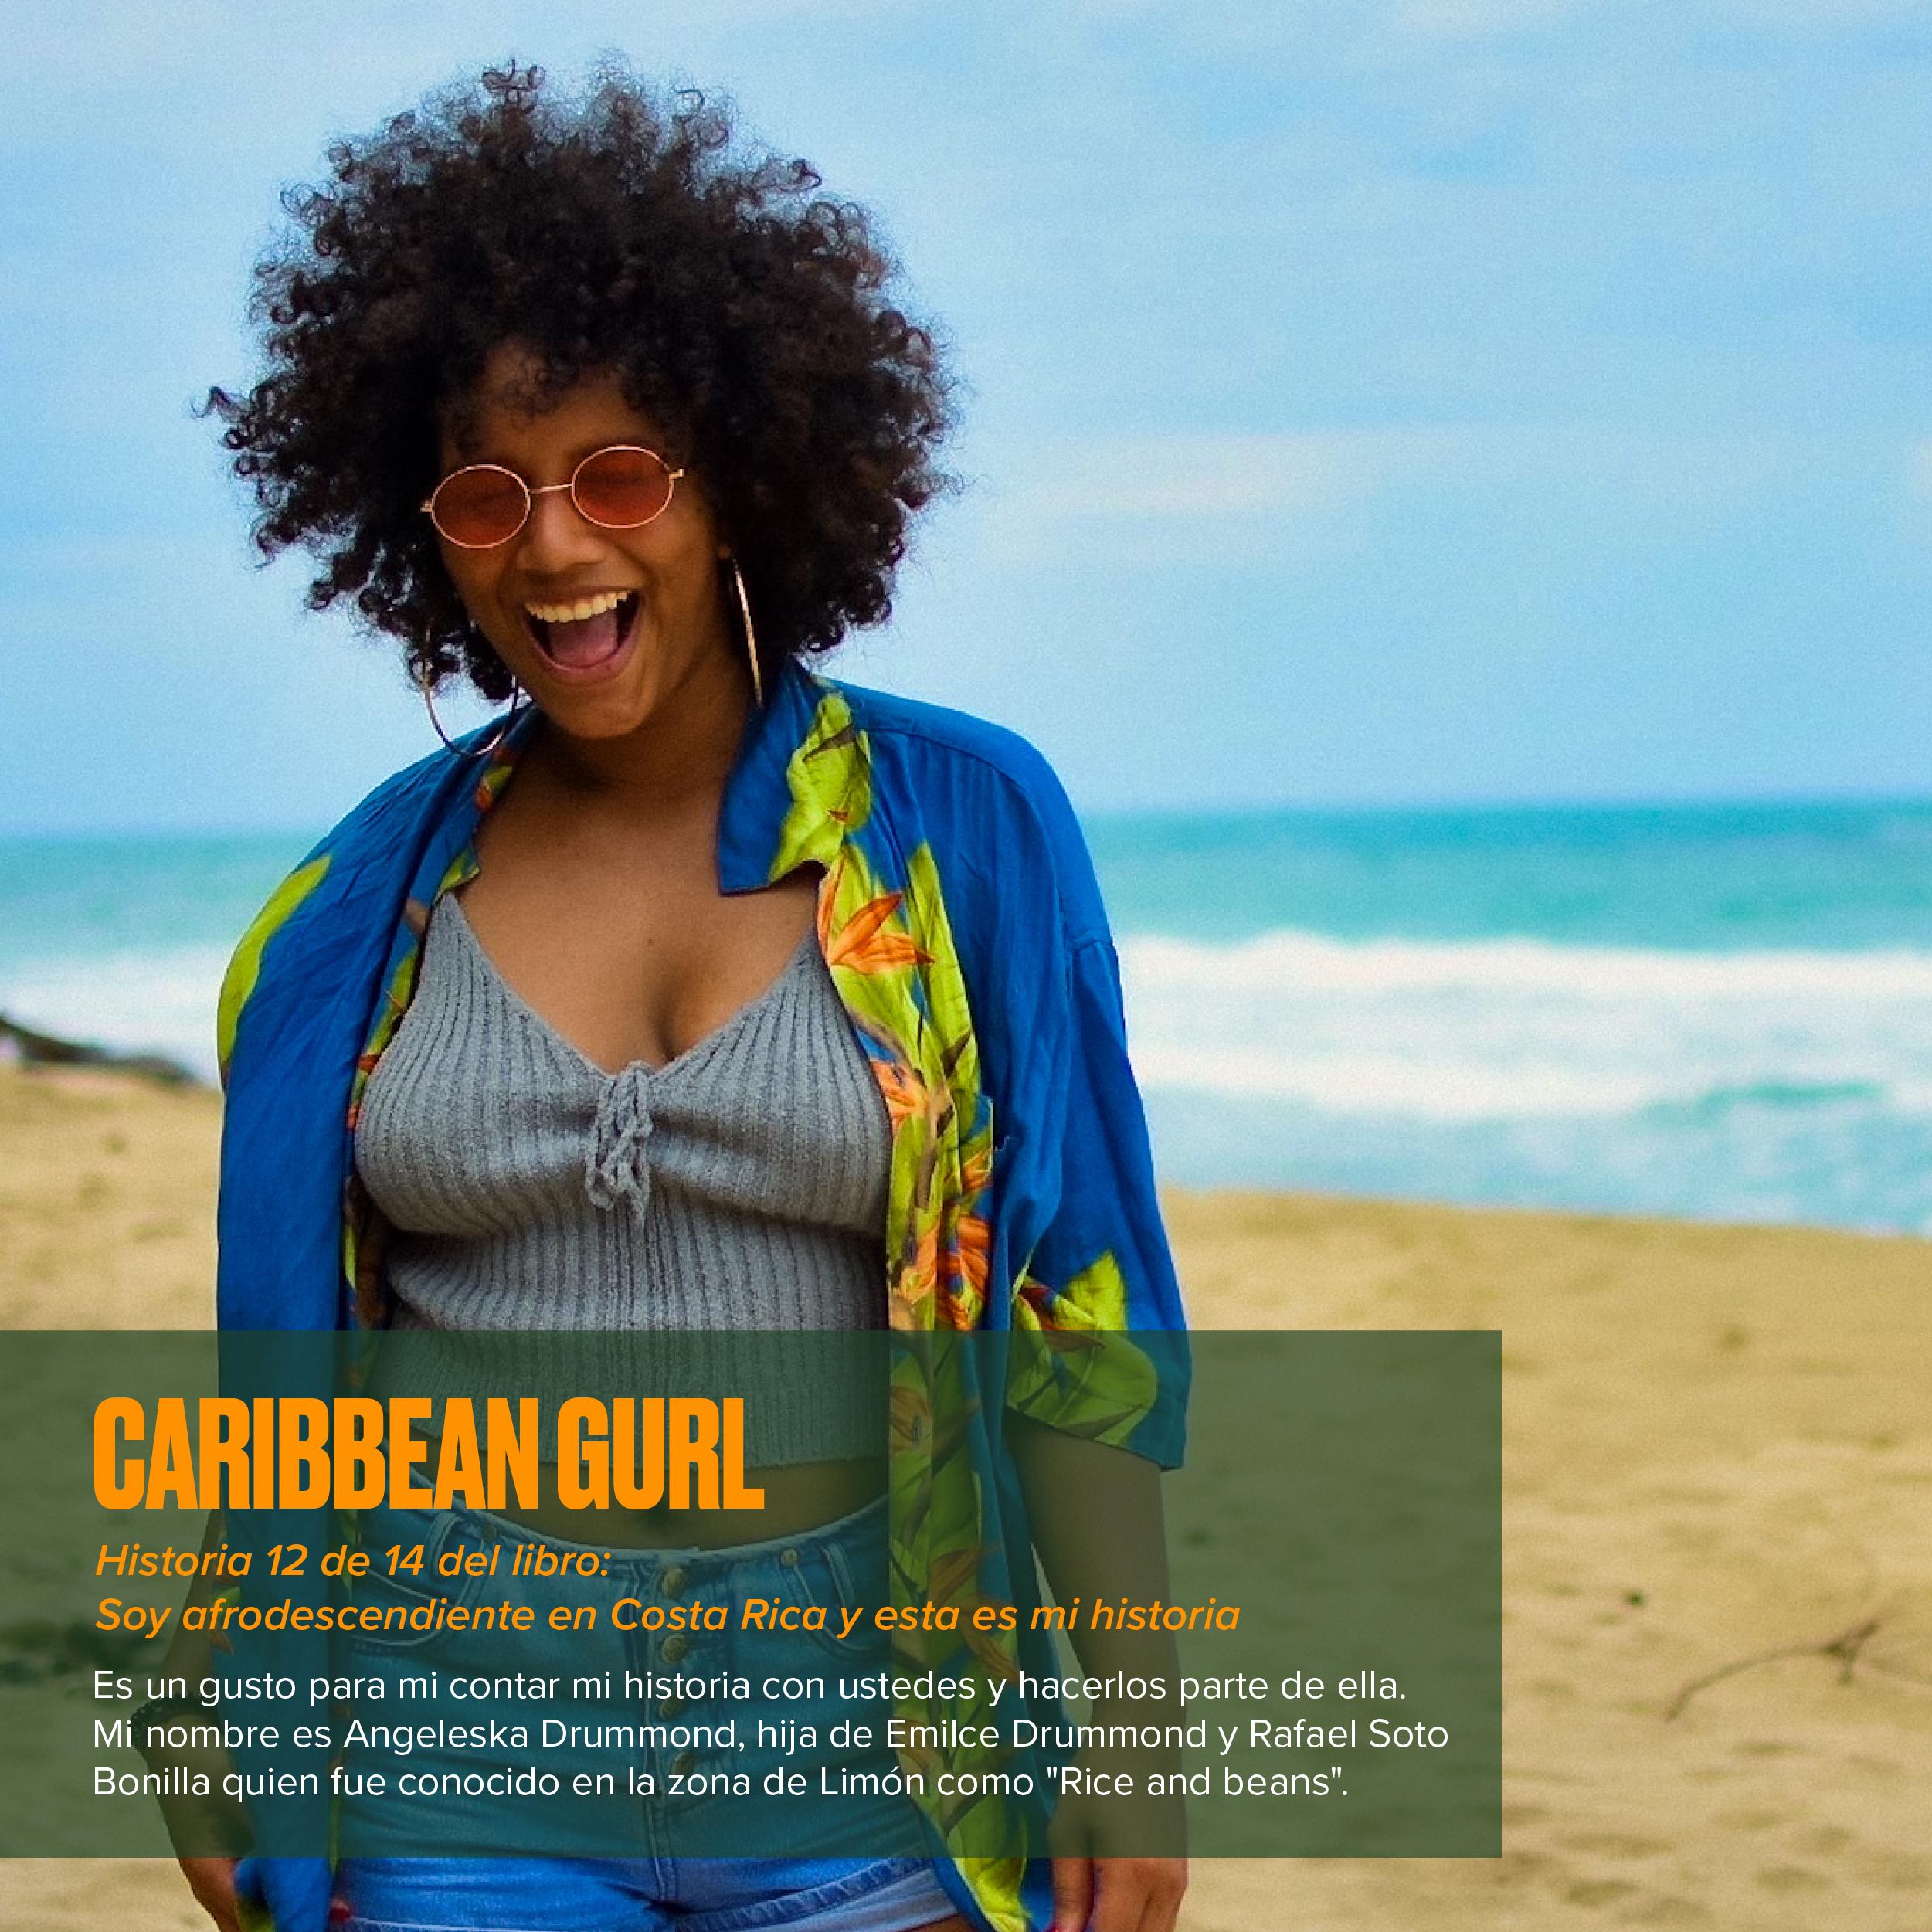 Caribbean gurl: Historias afrodescendientes